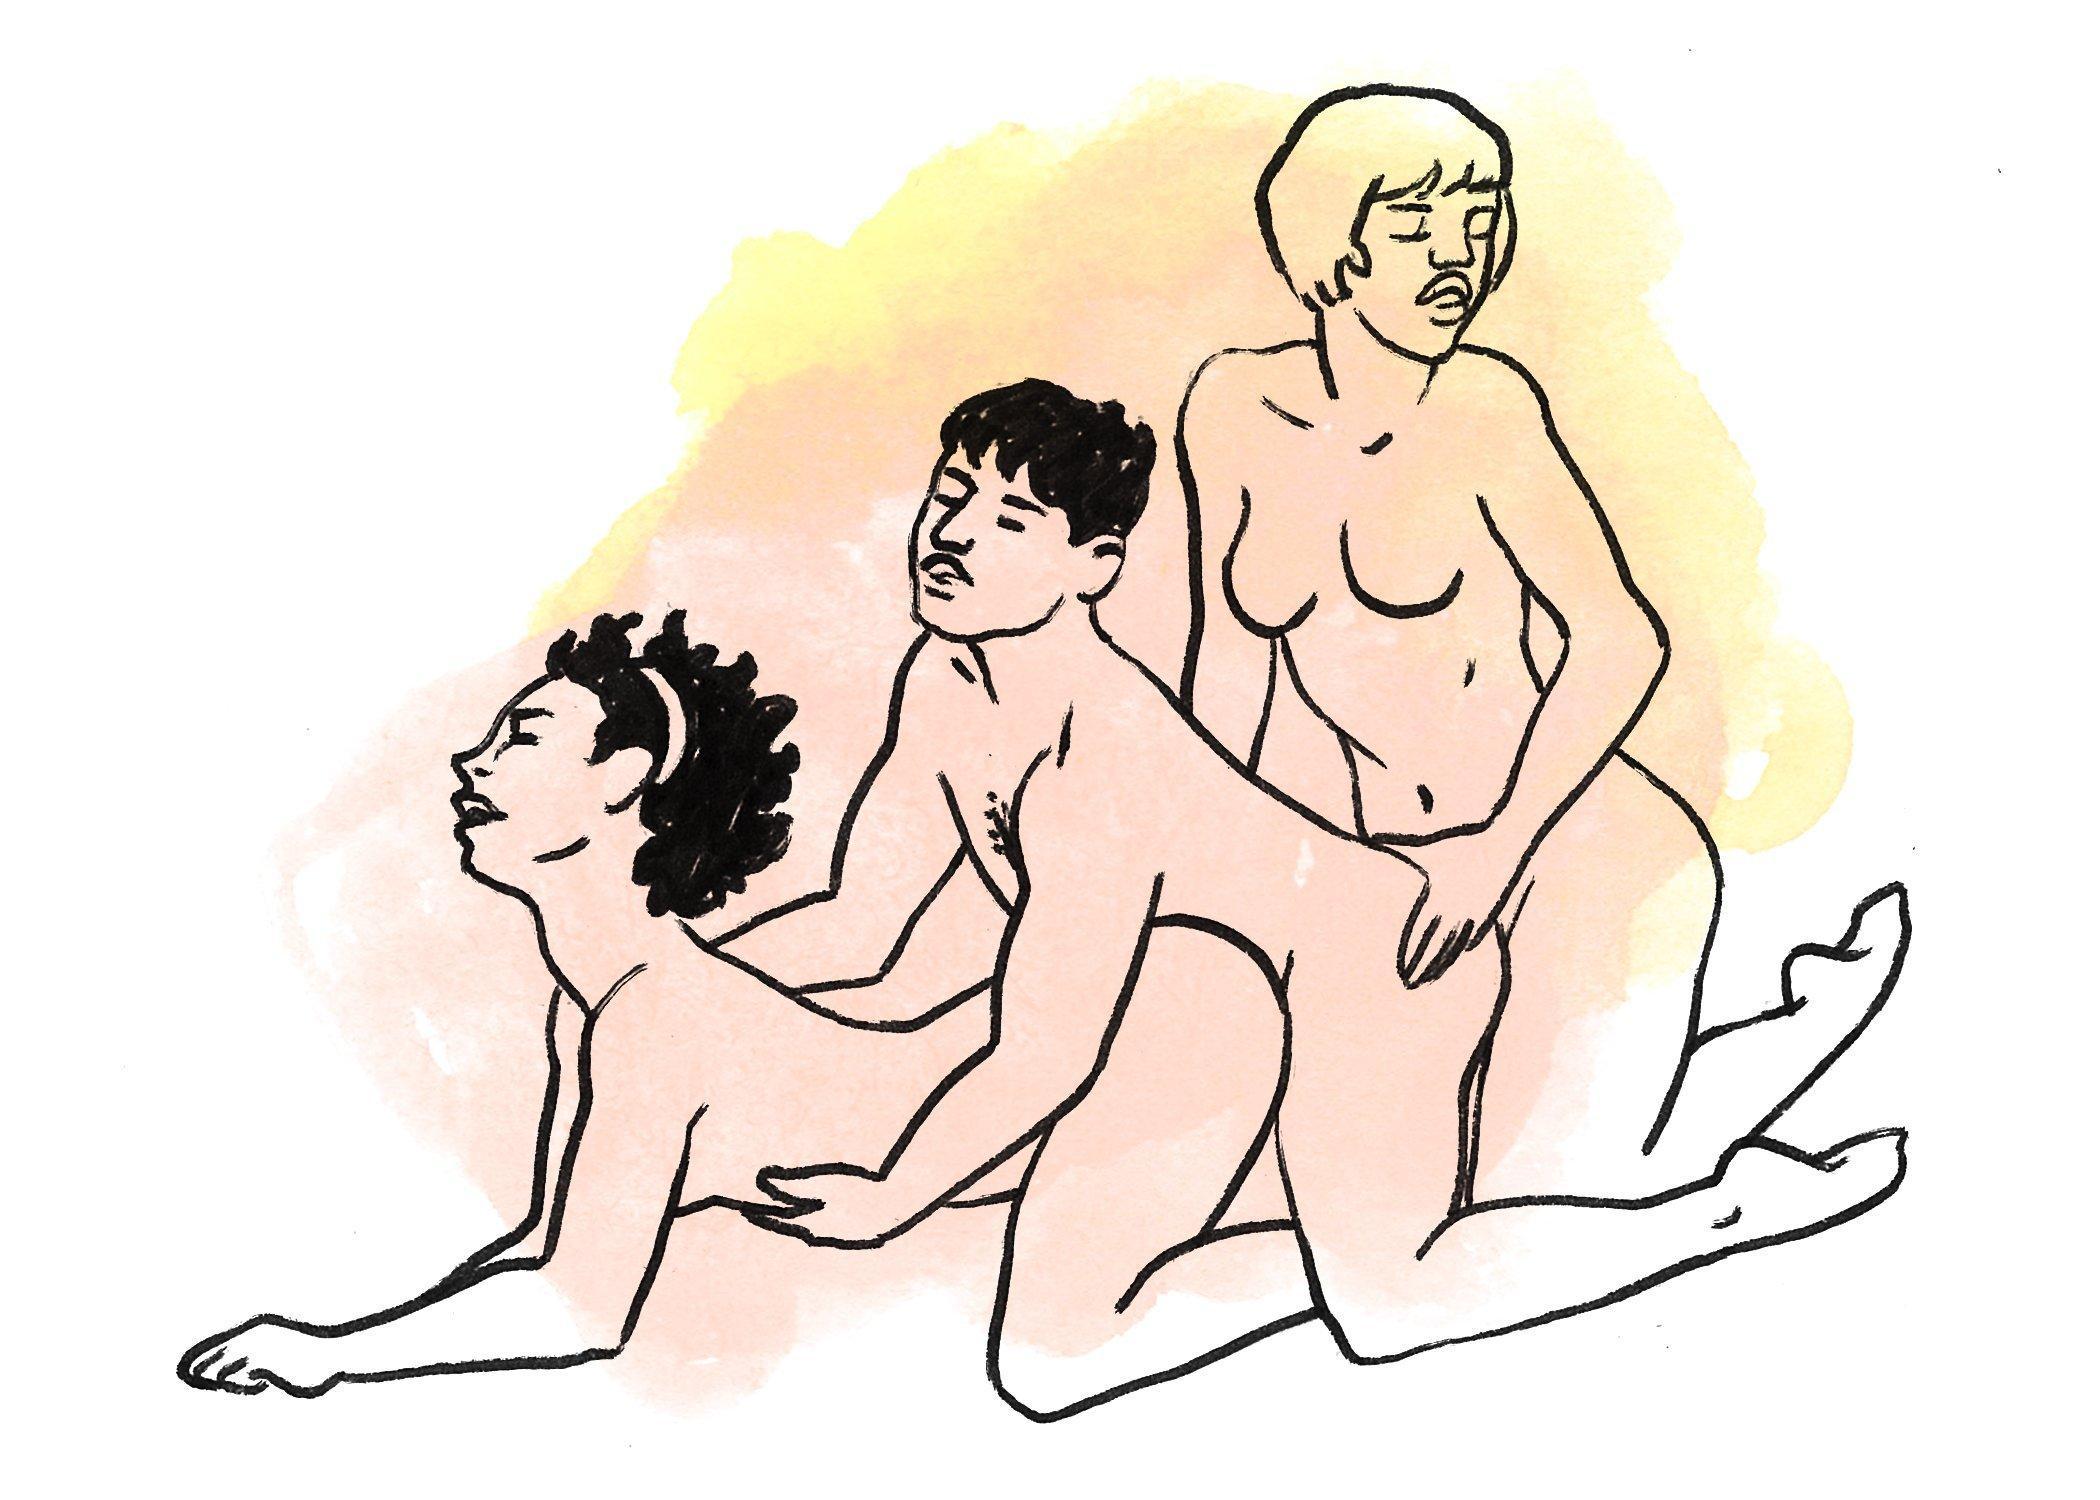 Bisexual threesome advice